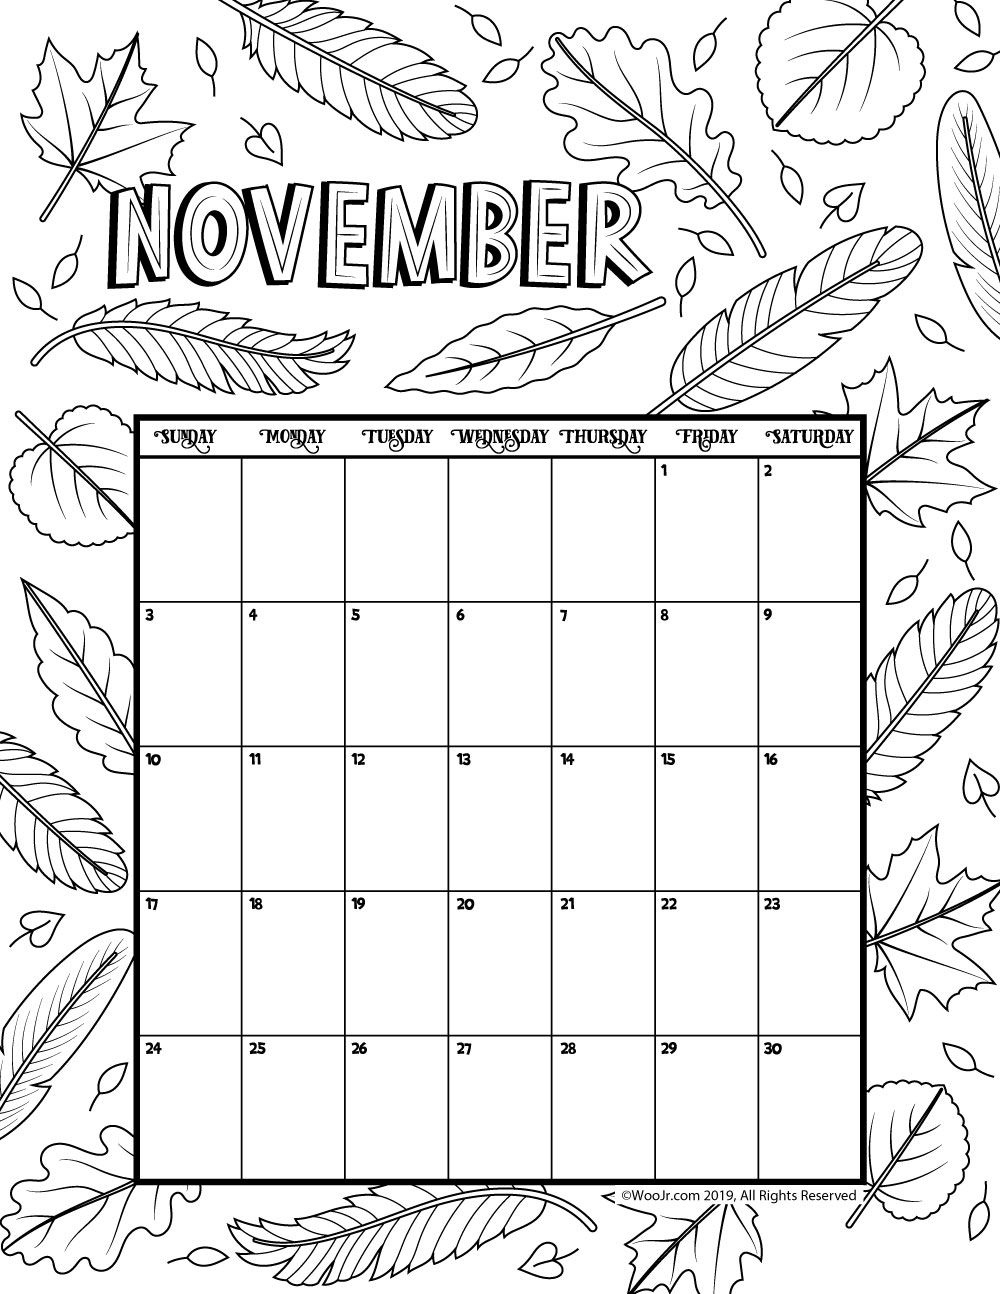 November 2019 Coloring Calendar | Woo! Jr. Kids Activities November Calendar Template Kindergarten